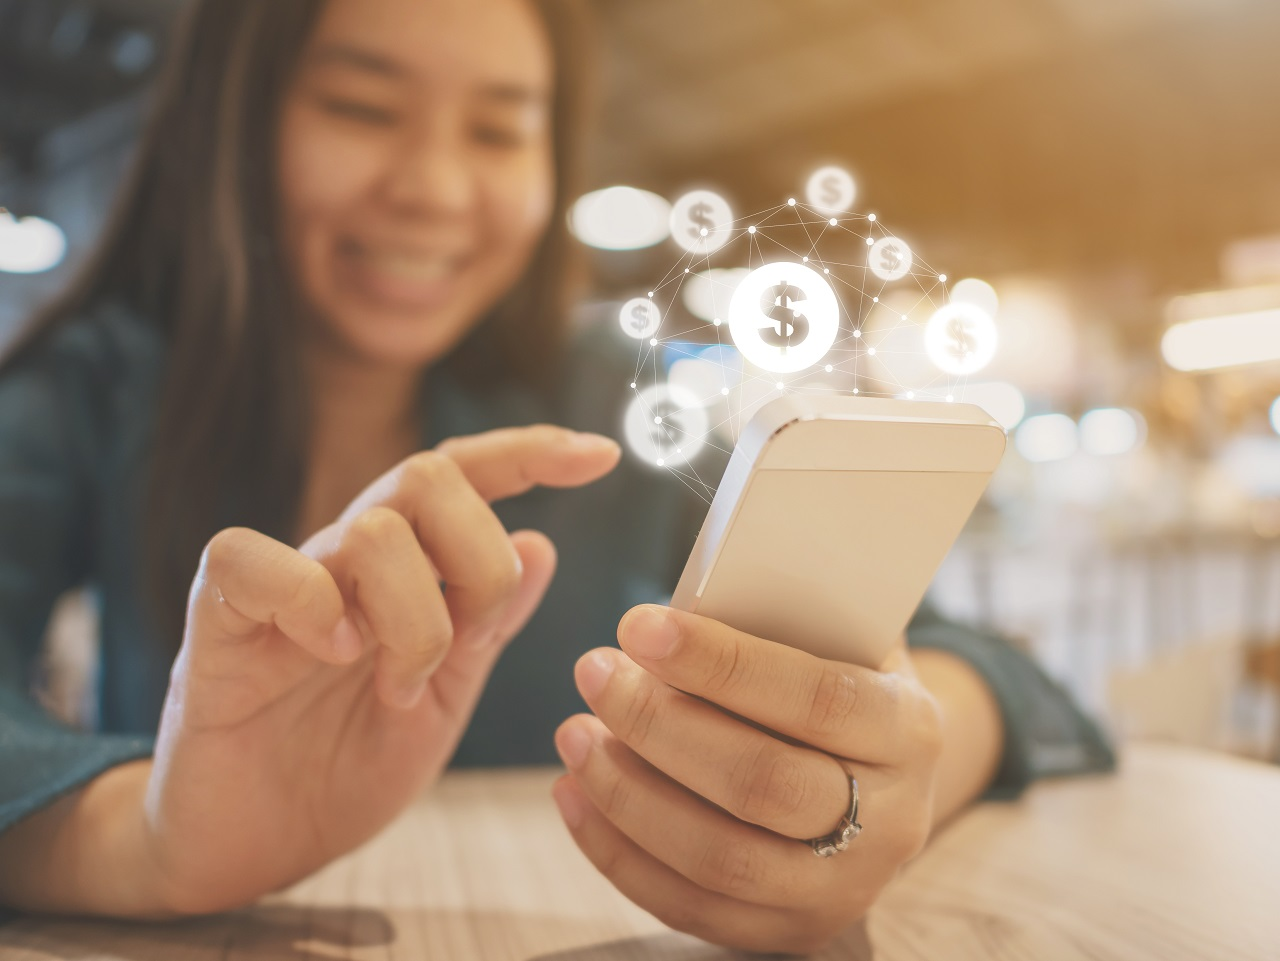 Kvinne - mobilteleforn - Smartphone - Bank-ID - Leading web solutions